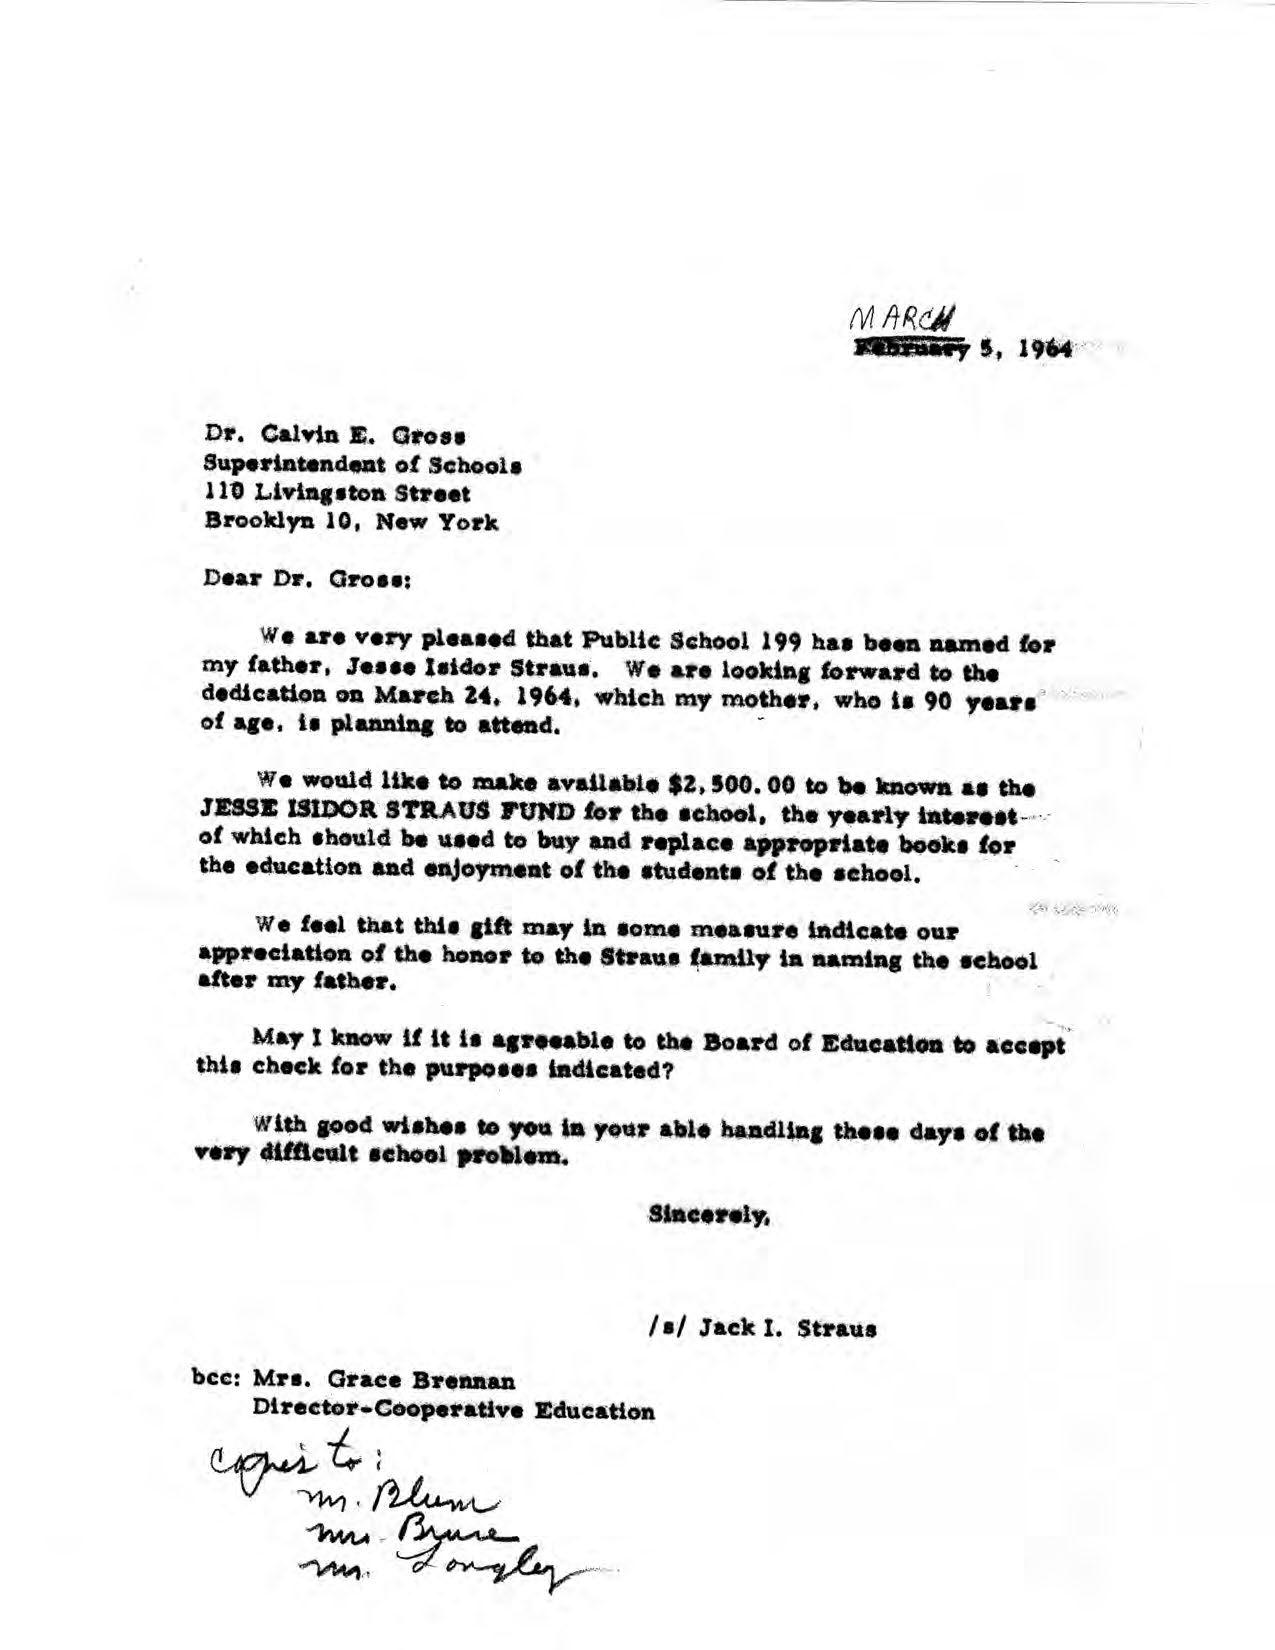 Jack I Straus Letter to Superintendent